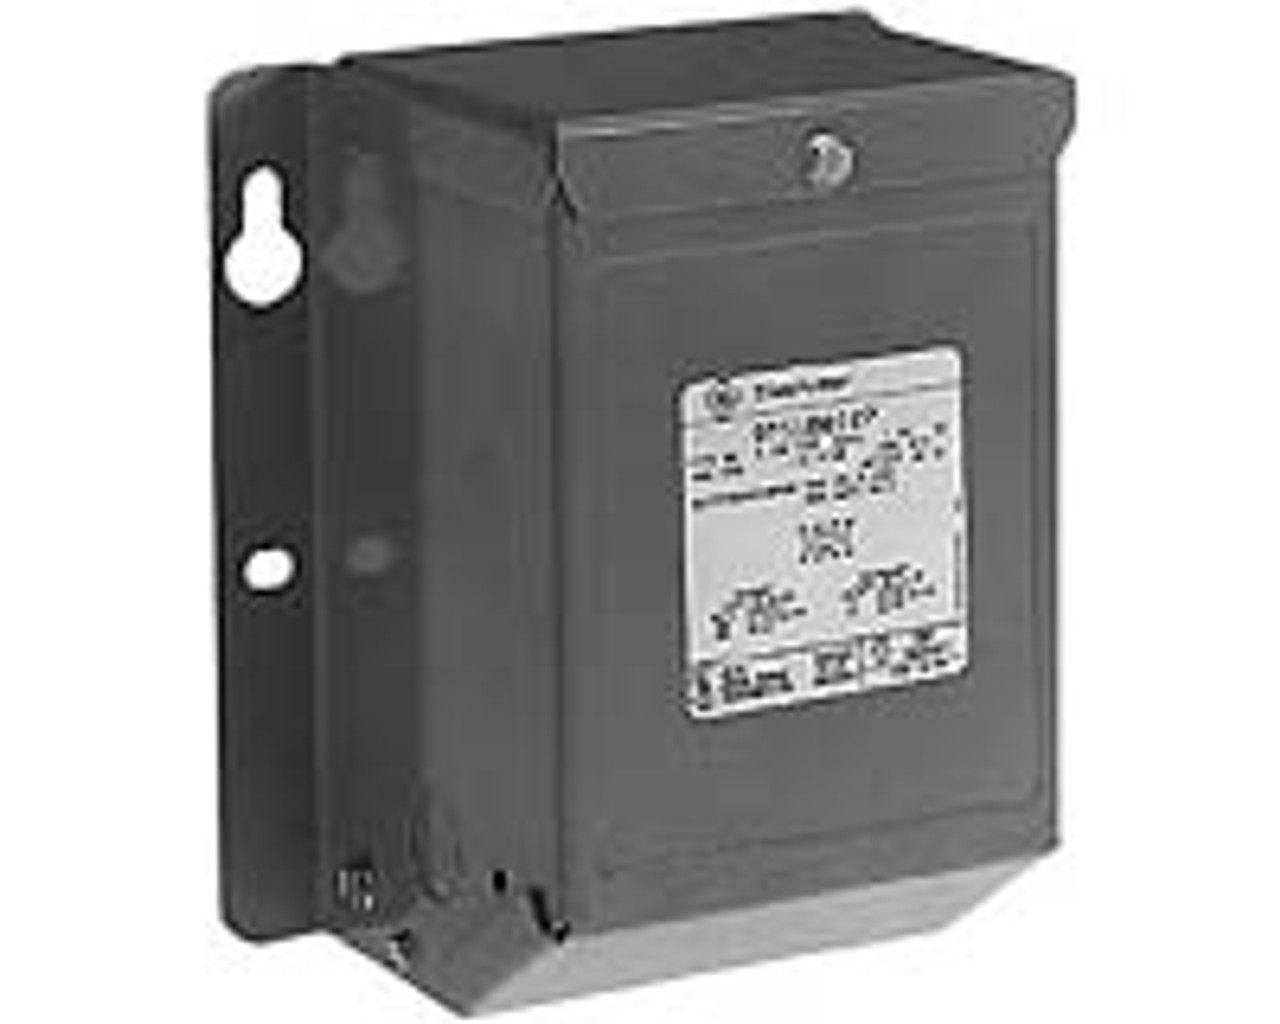 GE 9T51B0168 - 0.5 KVA 380/400/416 to 120/240 Volt, 1Ph 50 HZ Transformer - New